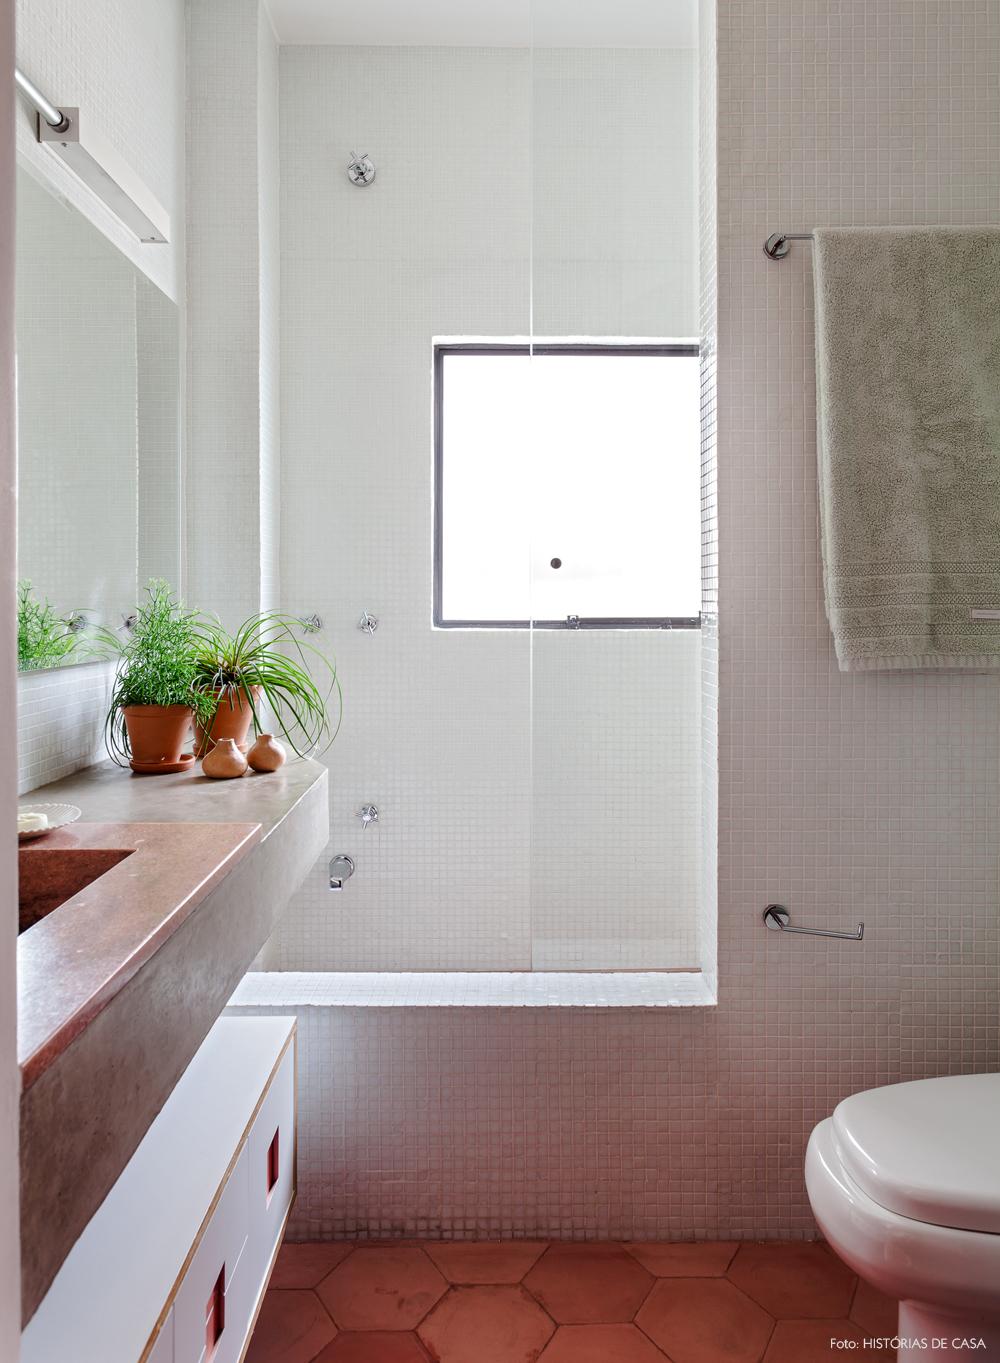 17-decoracao-reforma-banheiro-piso-ladrilhos-rosa-pastilhas